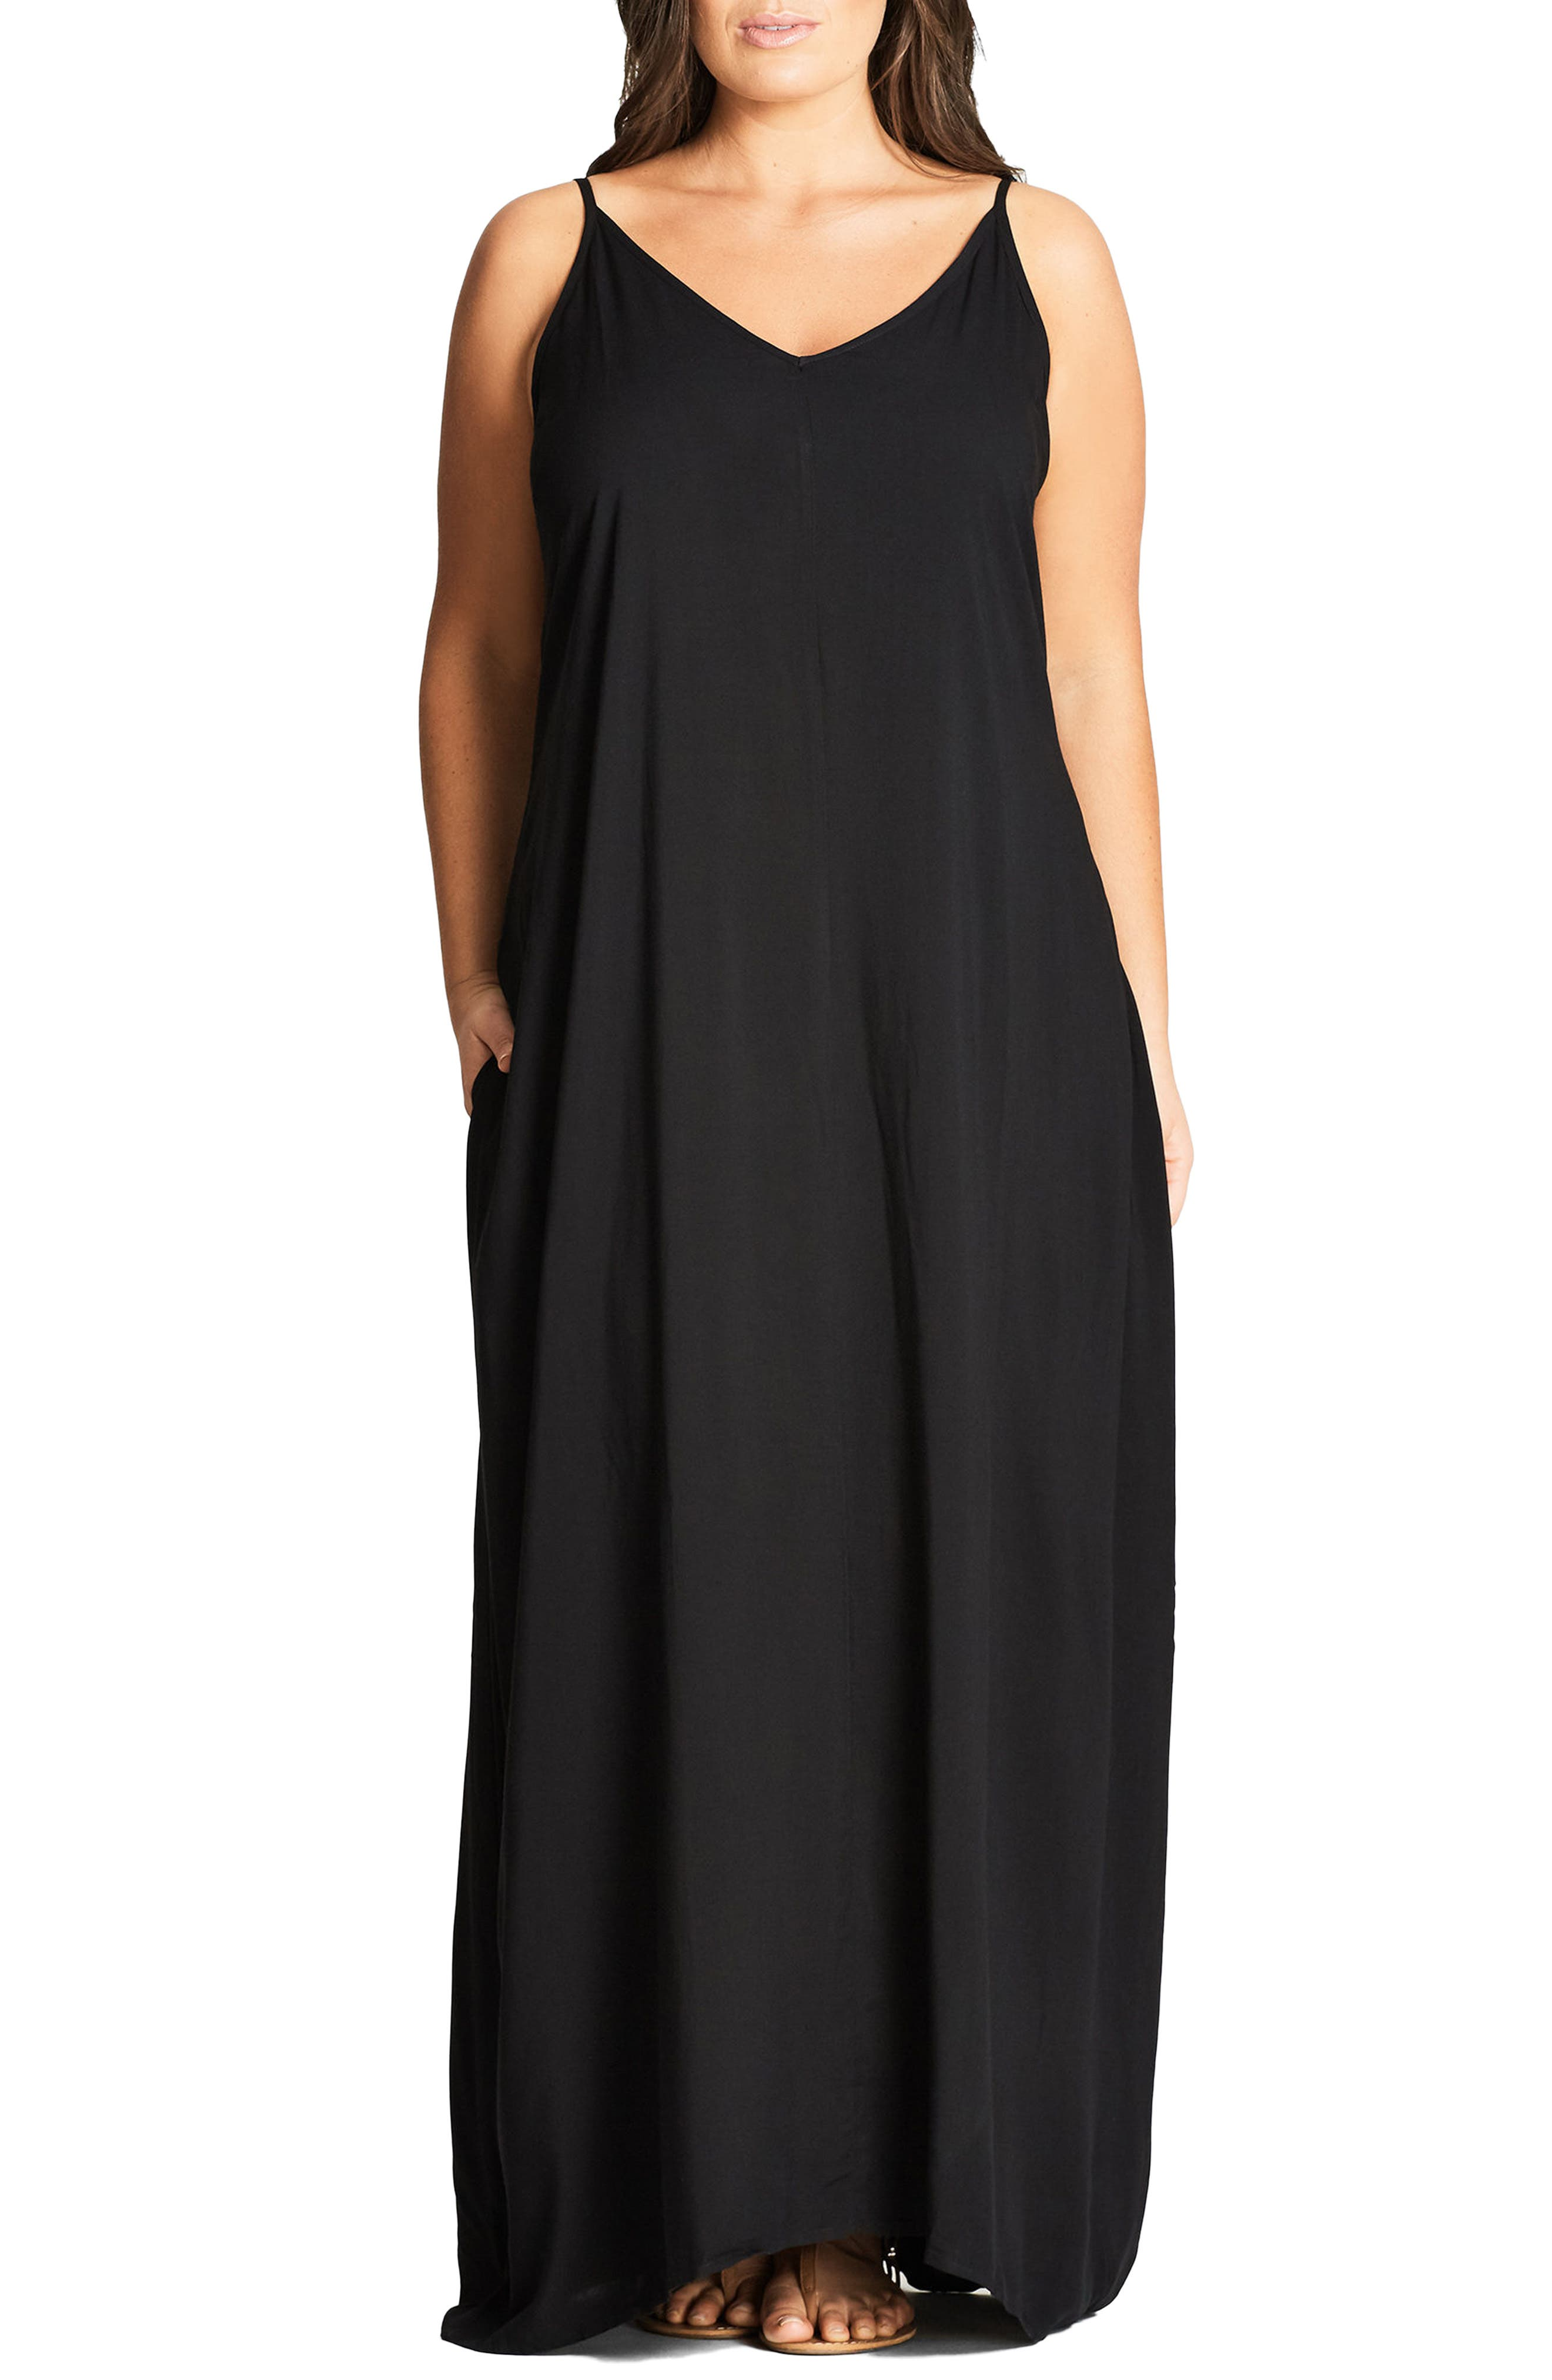 Main Image - City Chic V-Neck Maxi Dress (Plus Size)